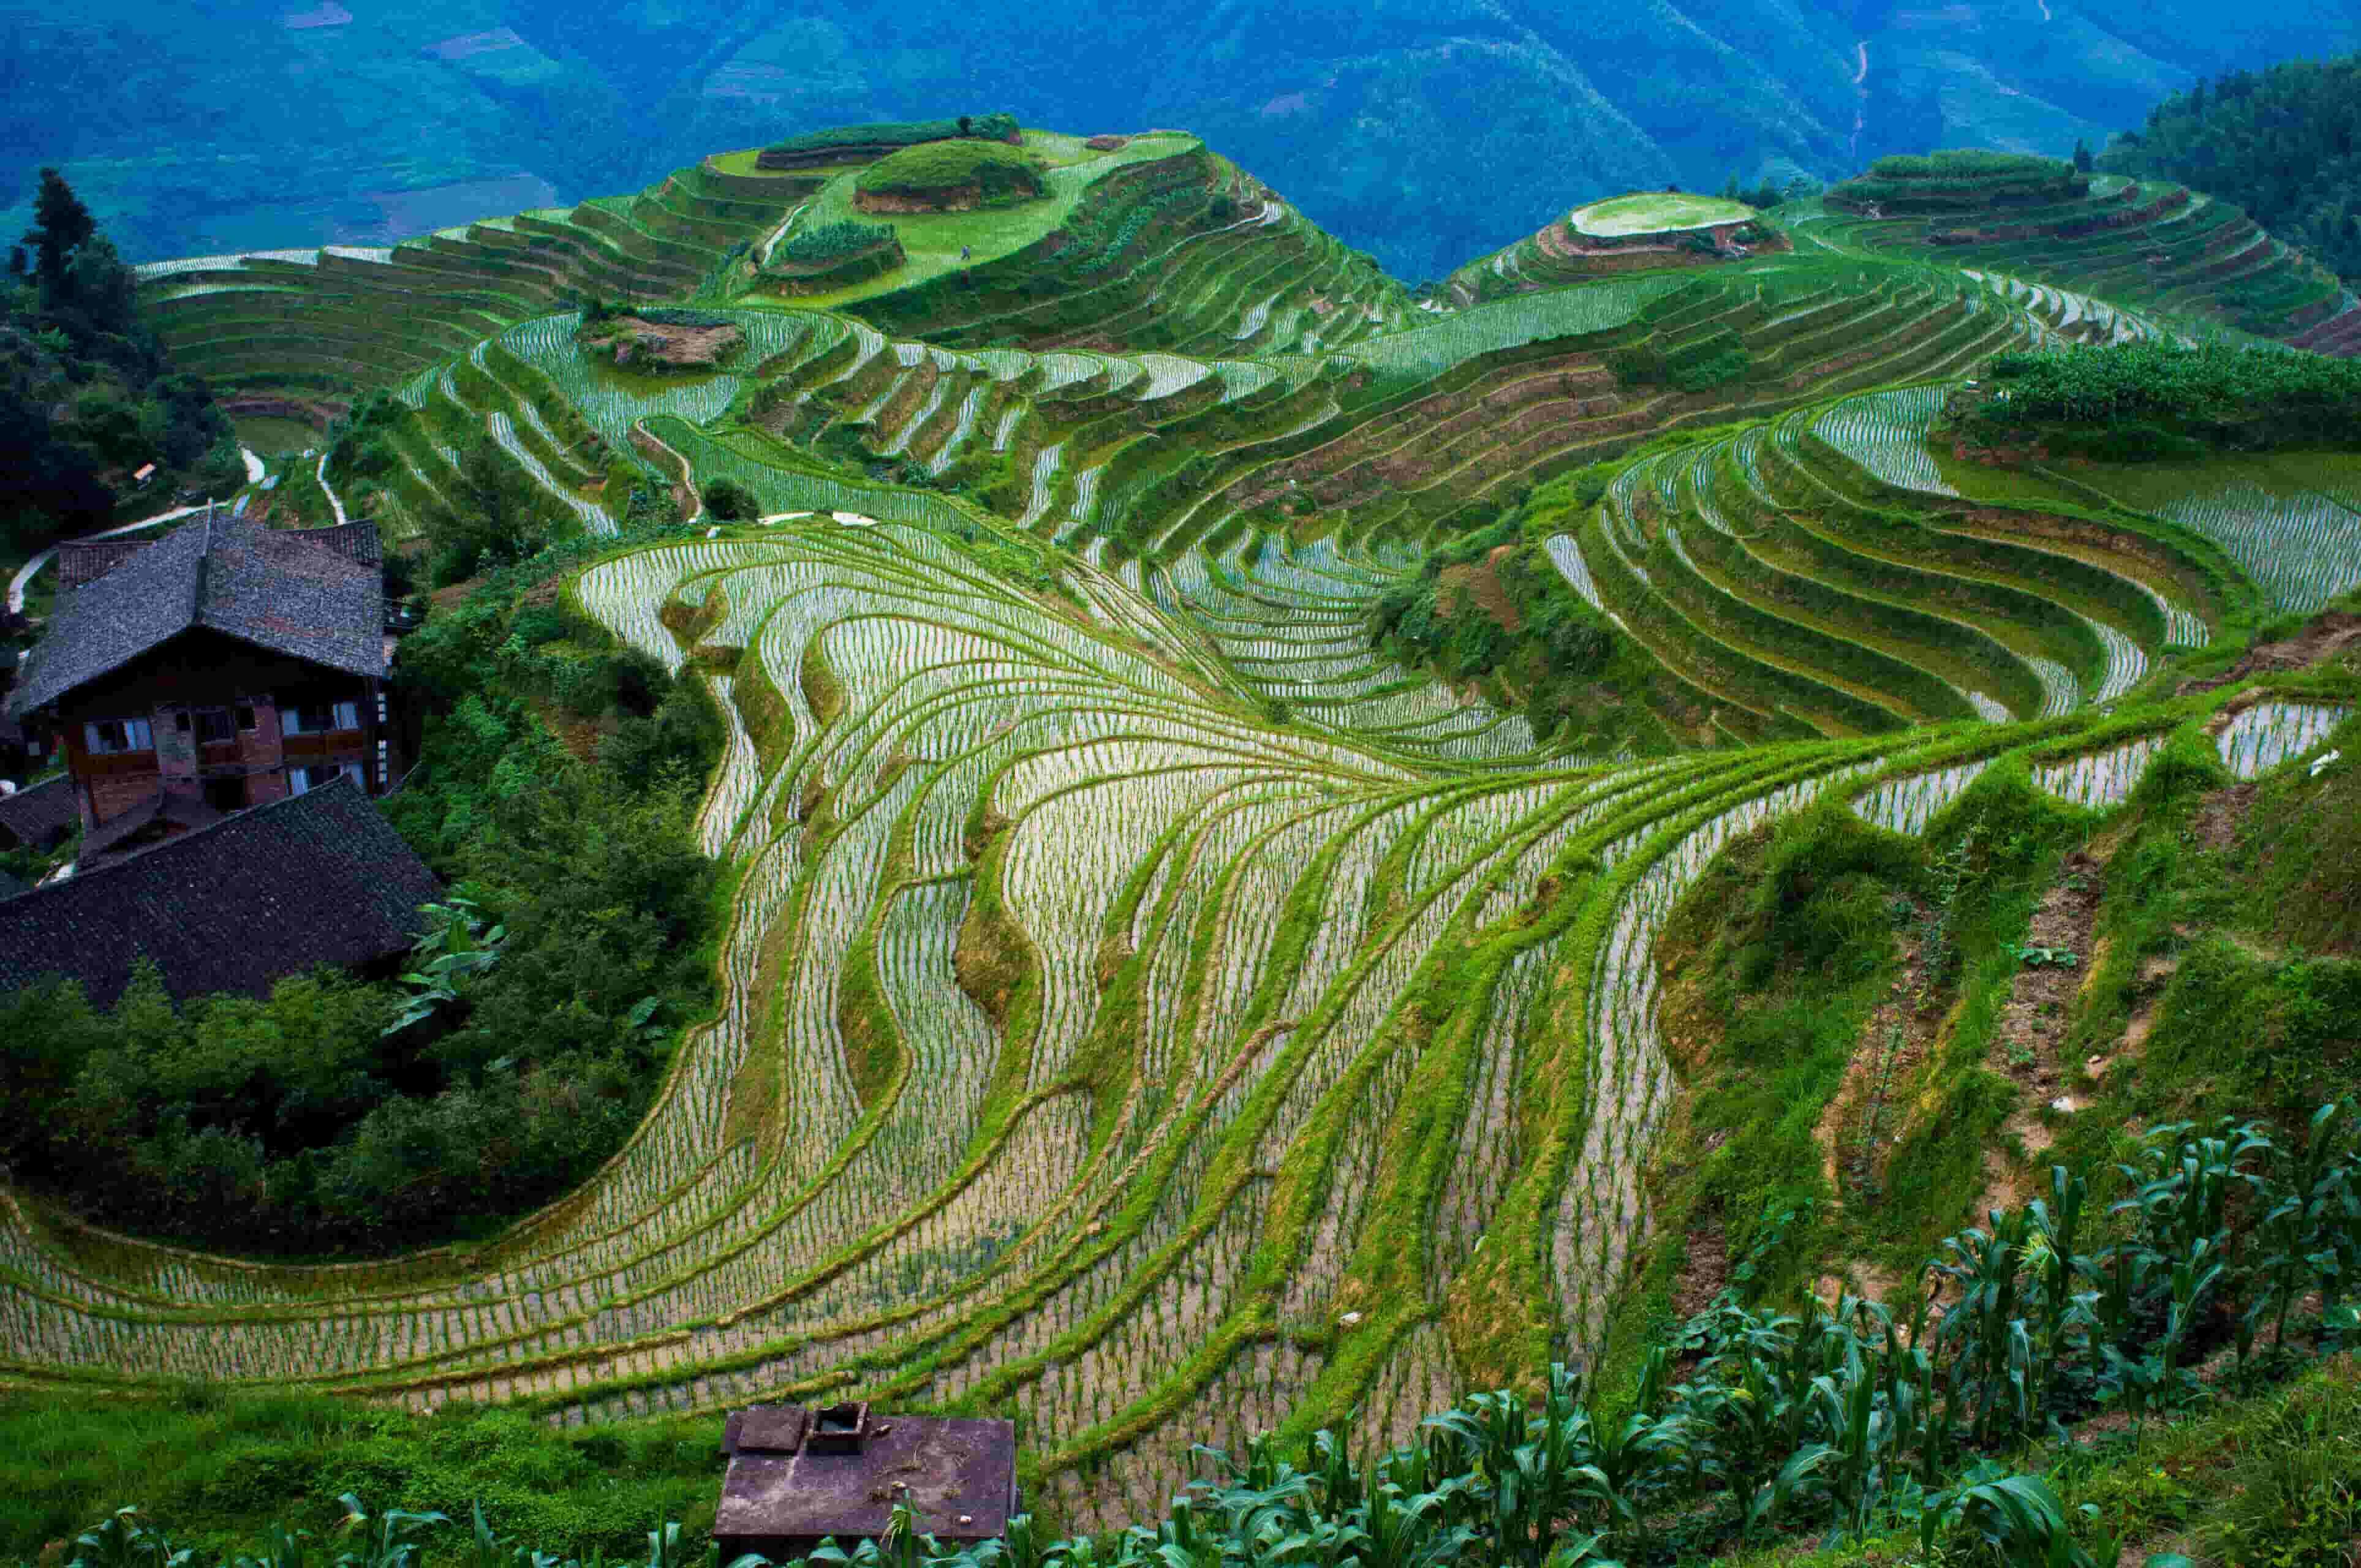 Longji near Guilin